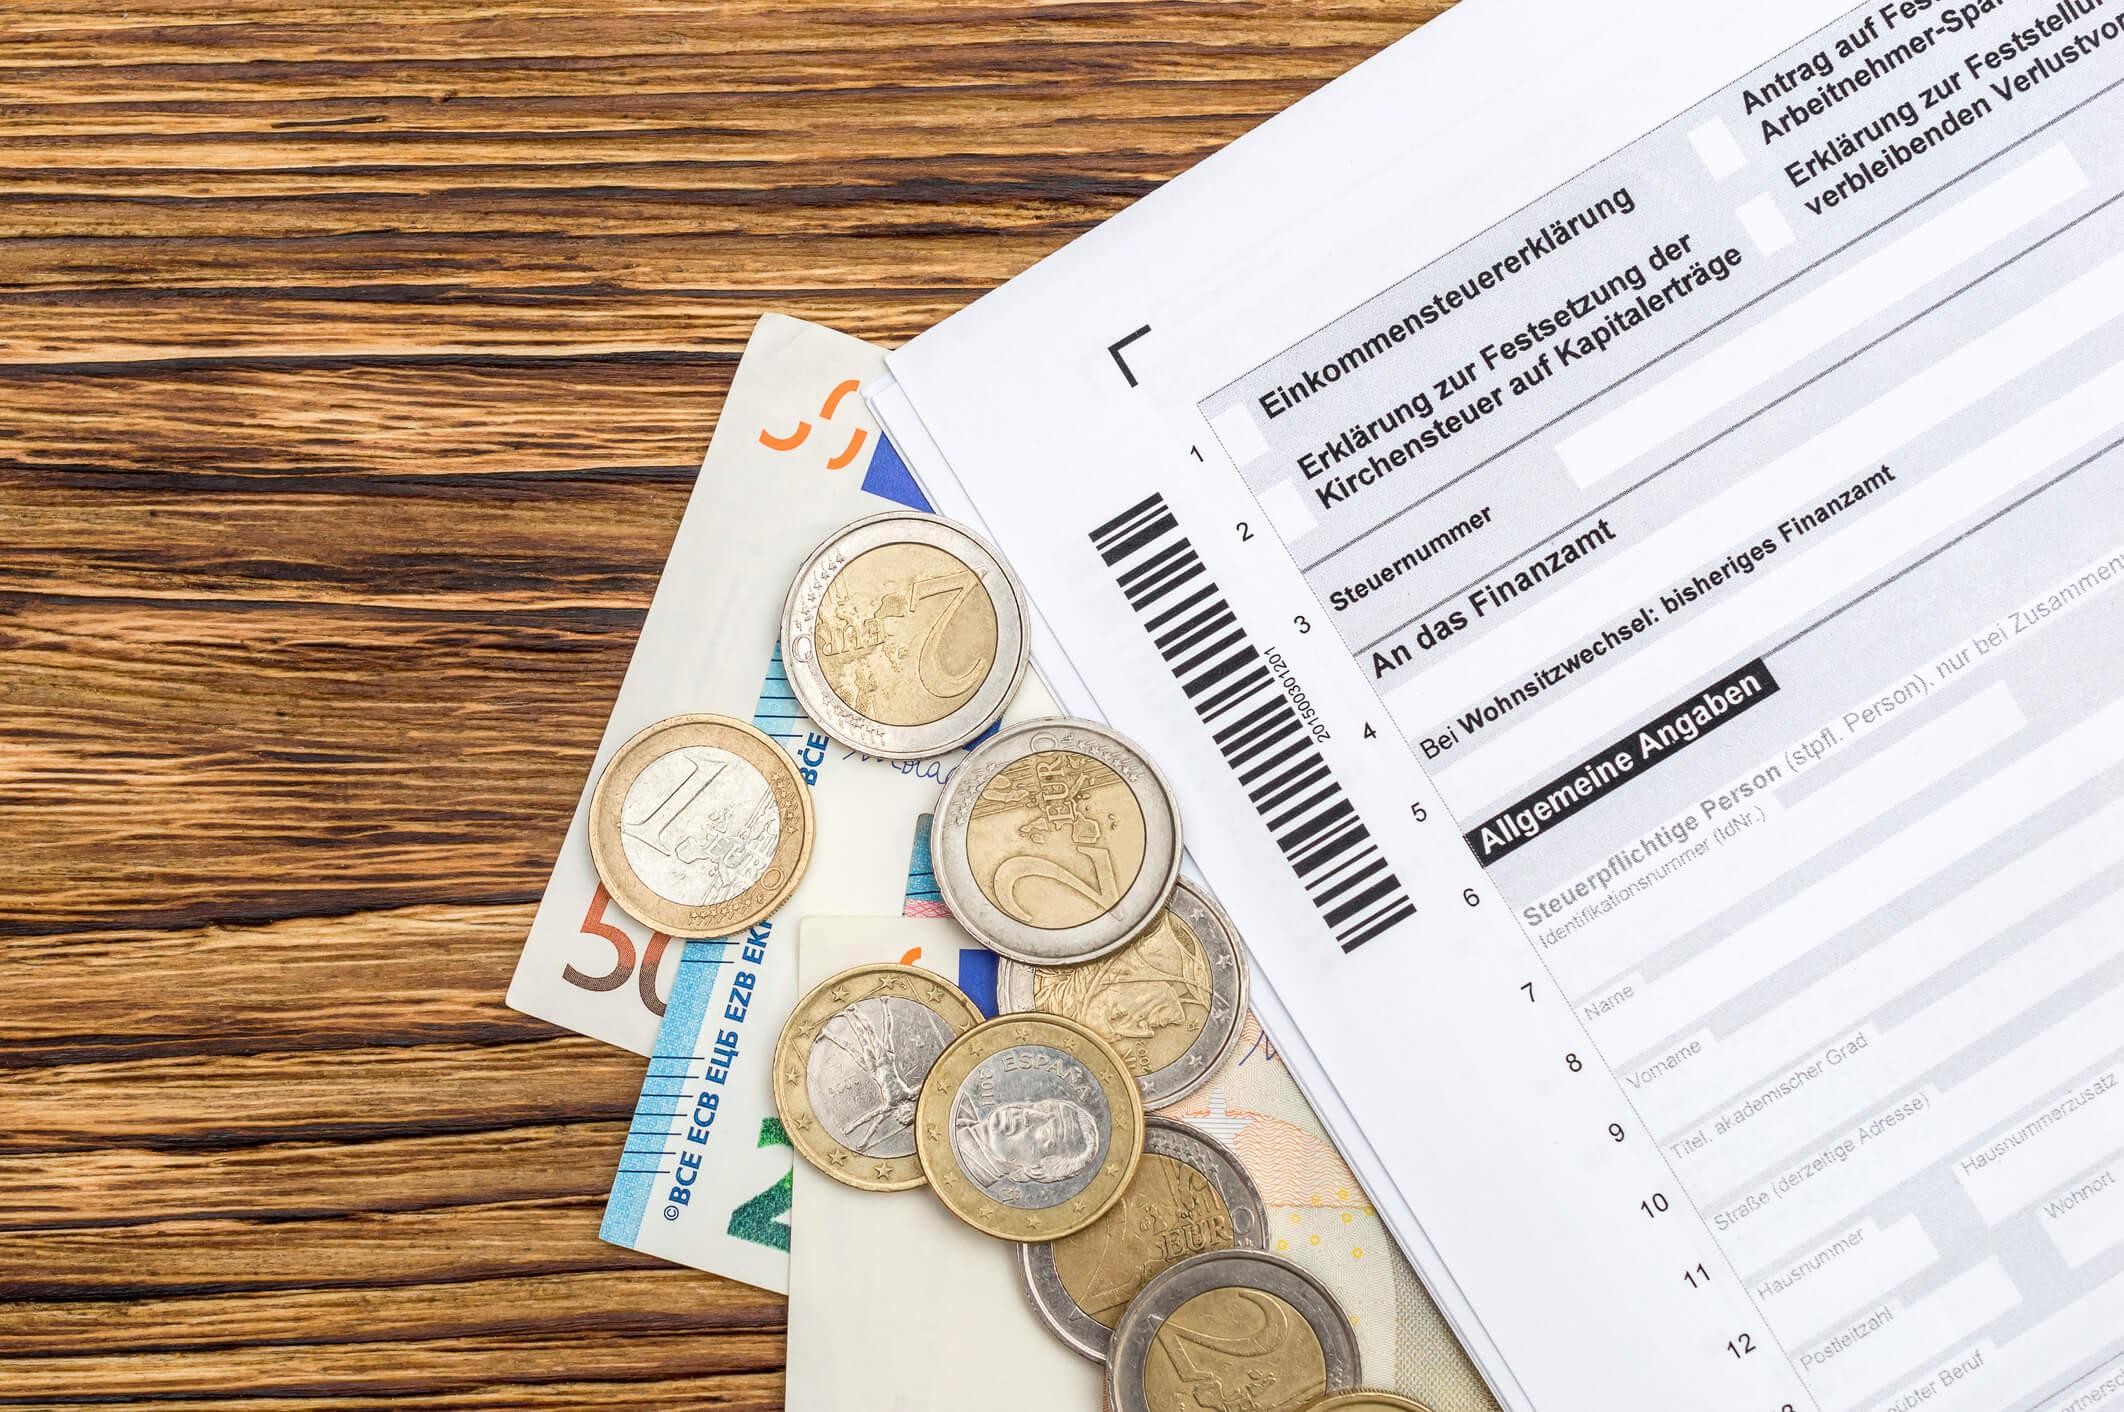 Steuerberatung Alfred Mayringer Jahresabschluss Finanzamt Bilanzierung Formular